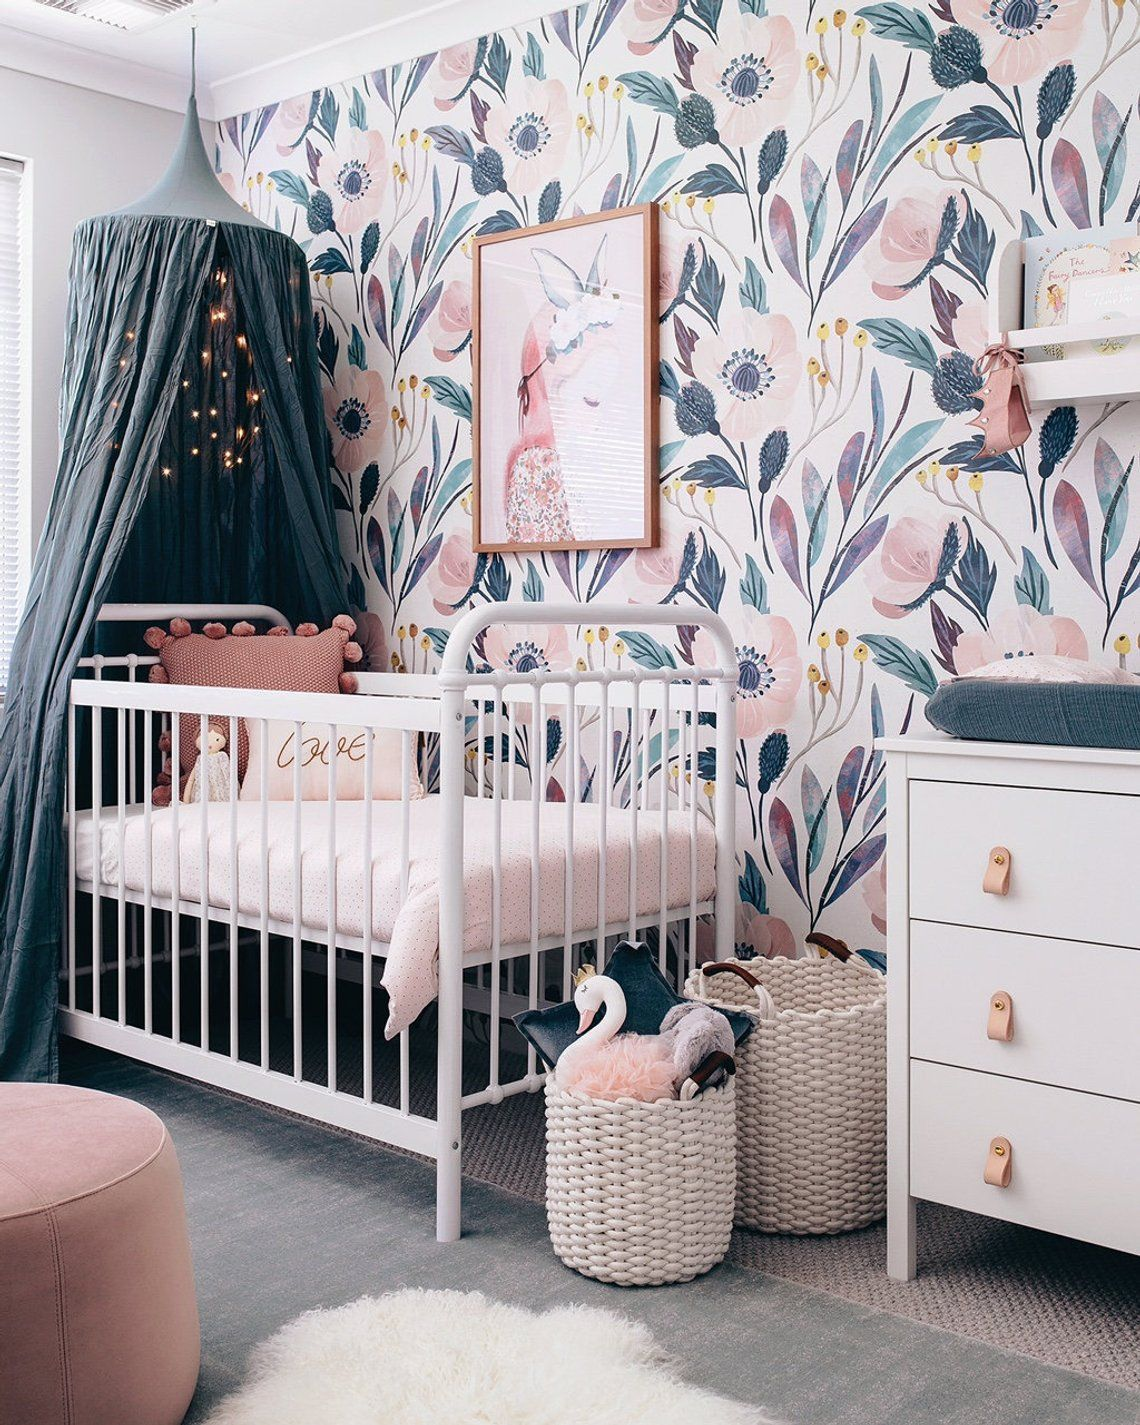 Removable Wallpaper Nursery Wall Decor Nursery Wallpaper